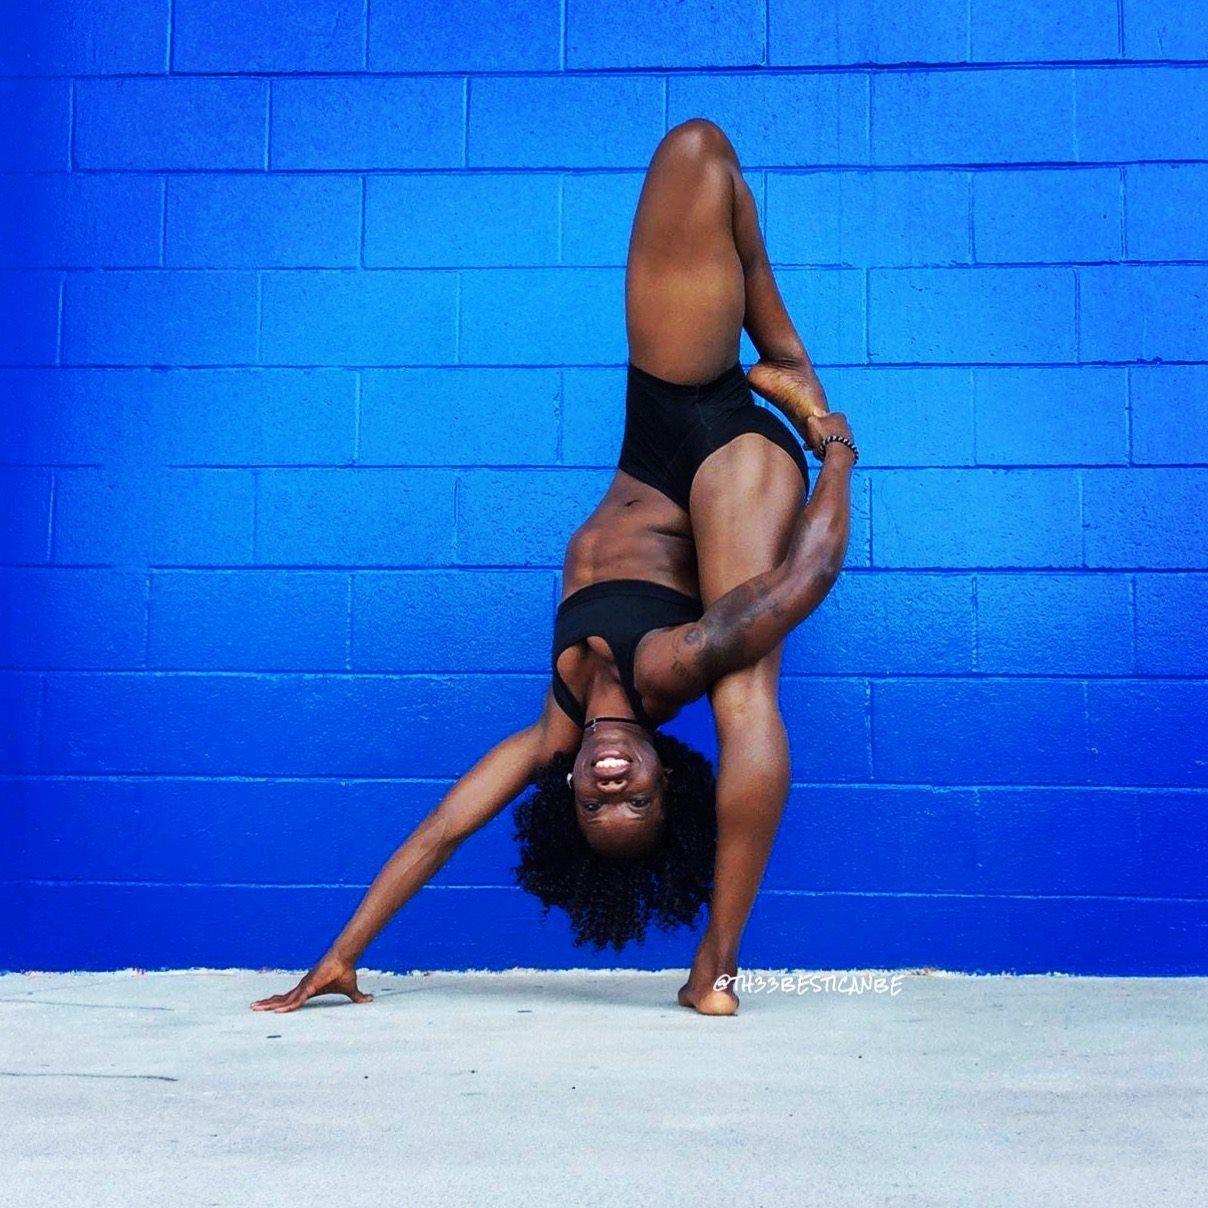 yoga, yoga photography, yoga poses, yoga ideas, black girl yoga, natural hair styles, natural hair, protective styles, yoga inspiration, advanced yoga, black queen, black models, melanin, ig models, black girl magic